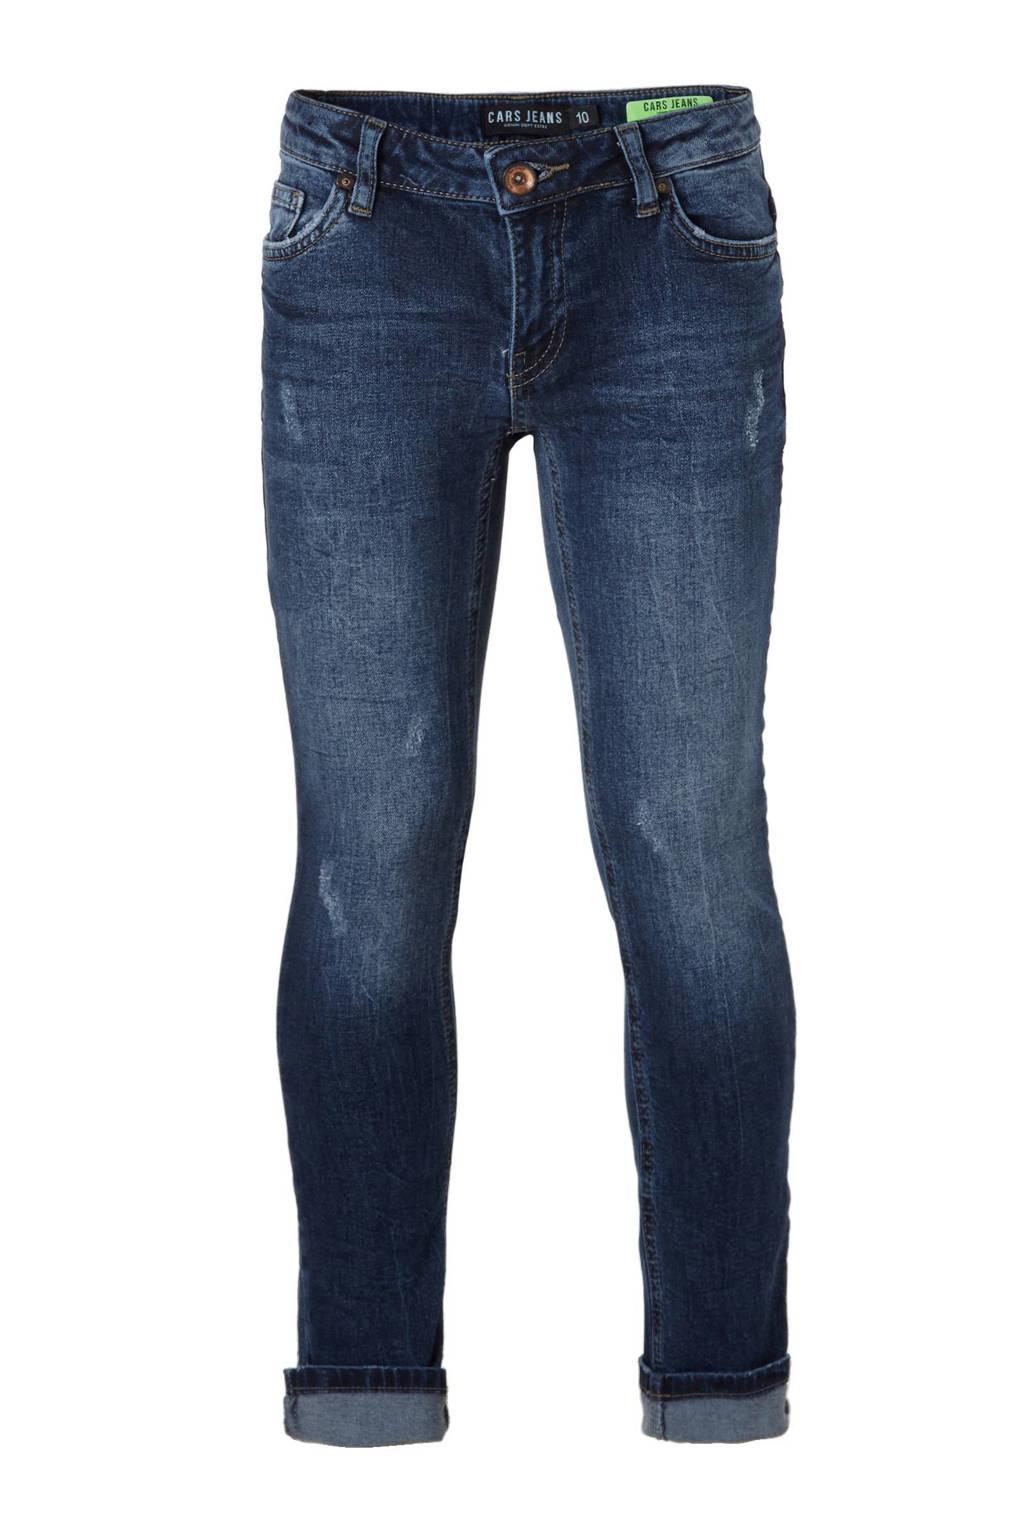 Cars Kenneth slim fit jeans, Dark used